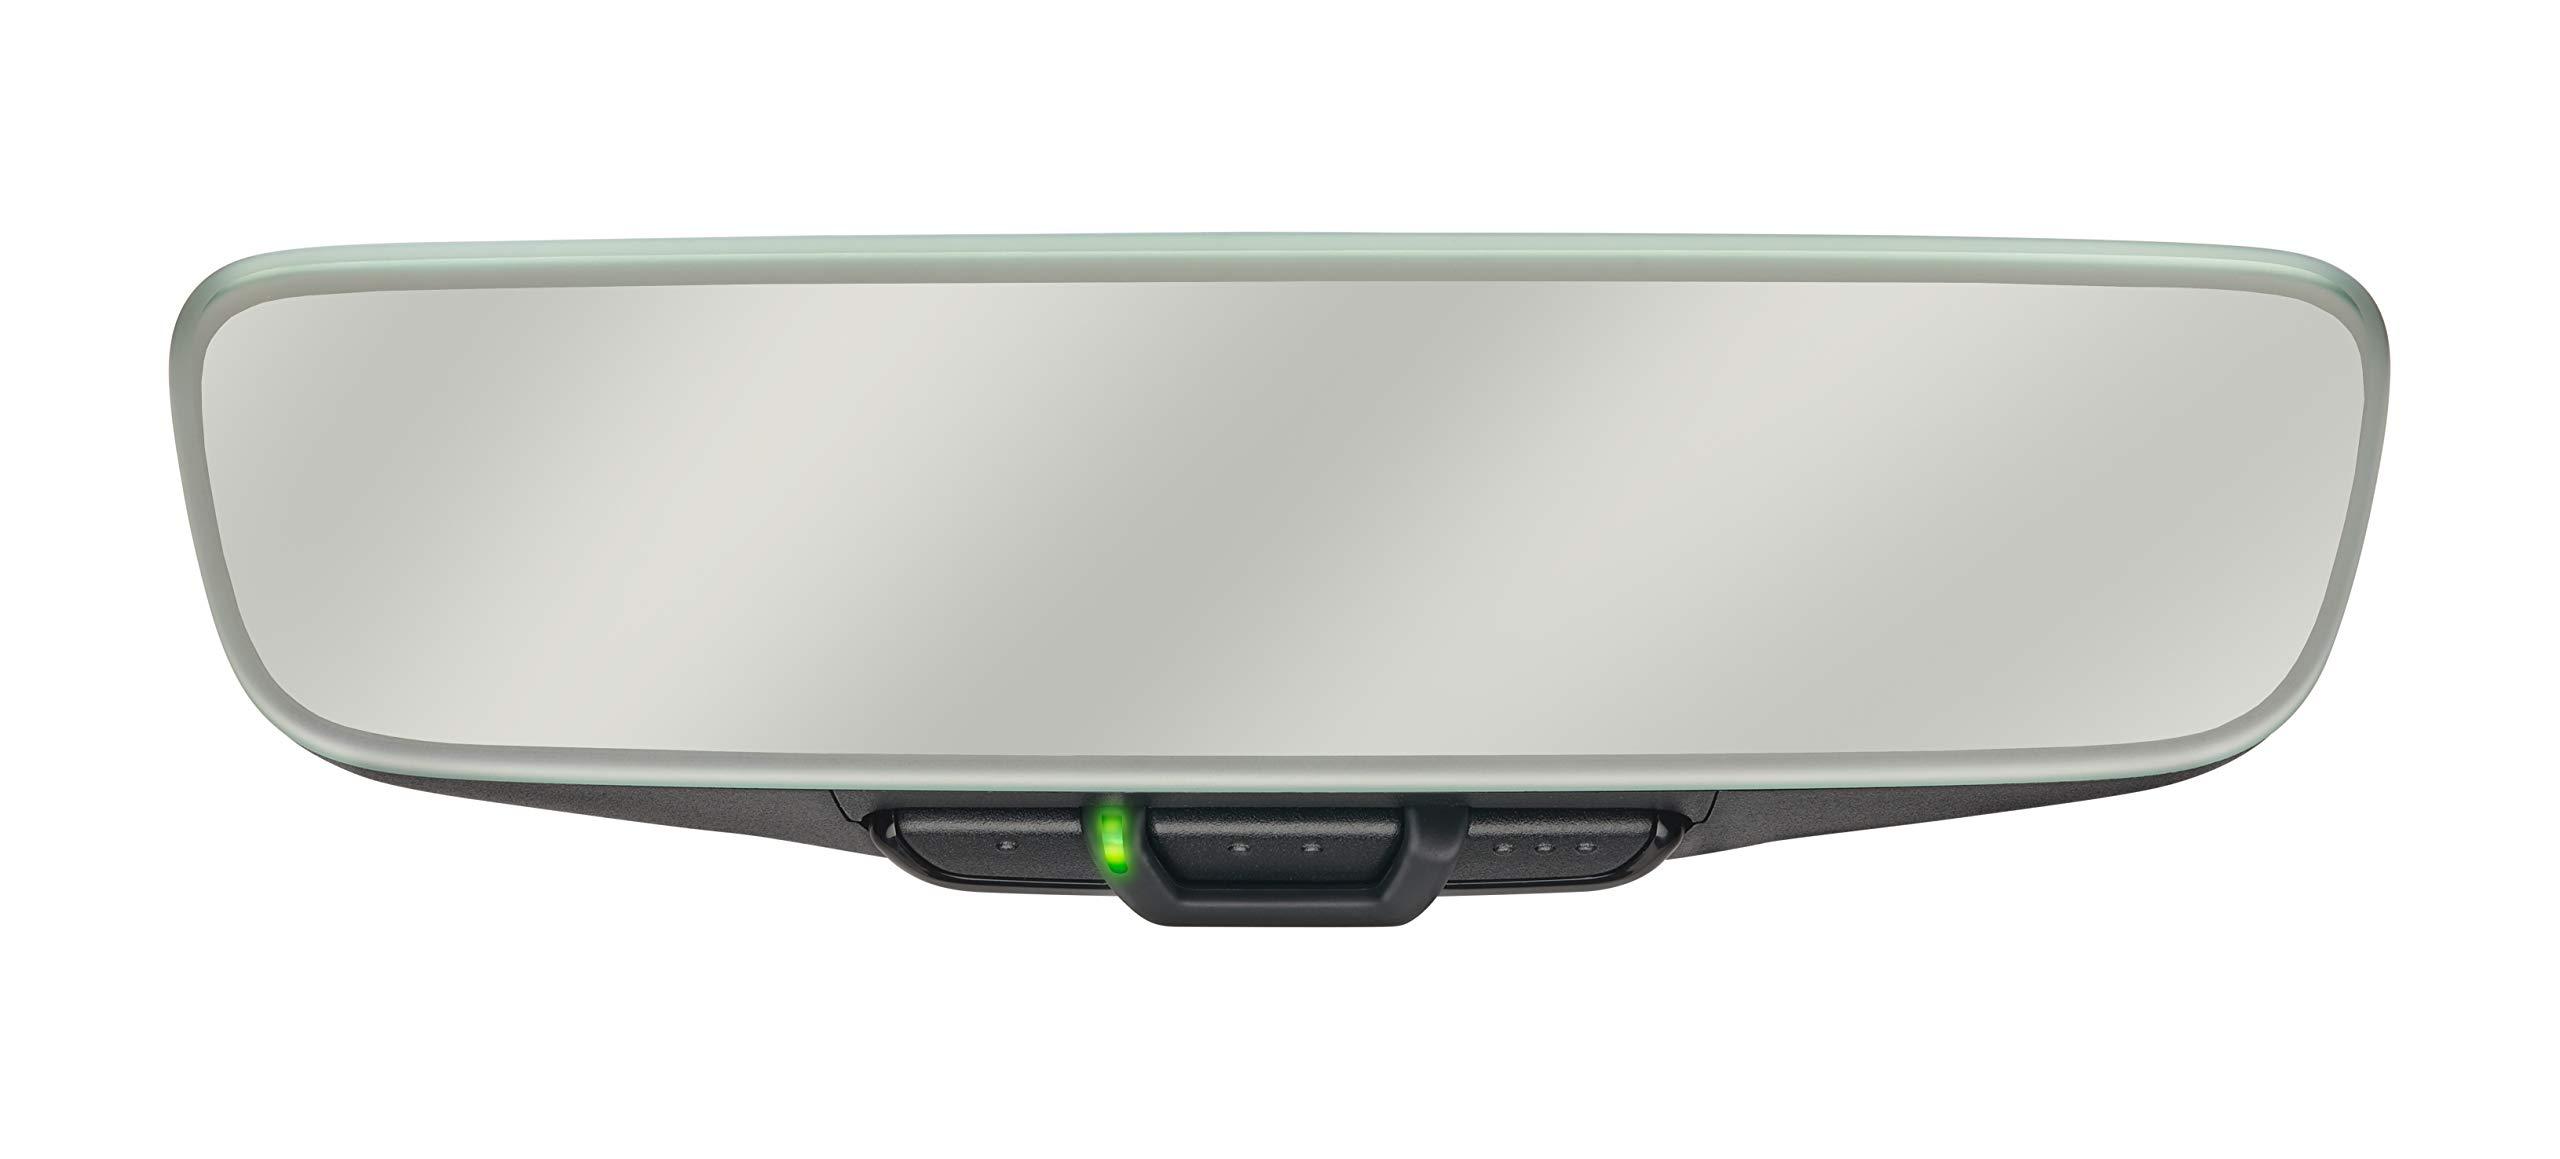 Chamberlain Group TM210 ARQ Mirror with Garage Door Opener One Size Black